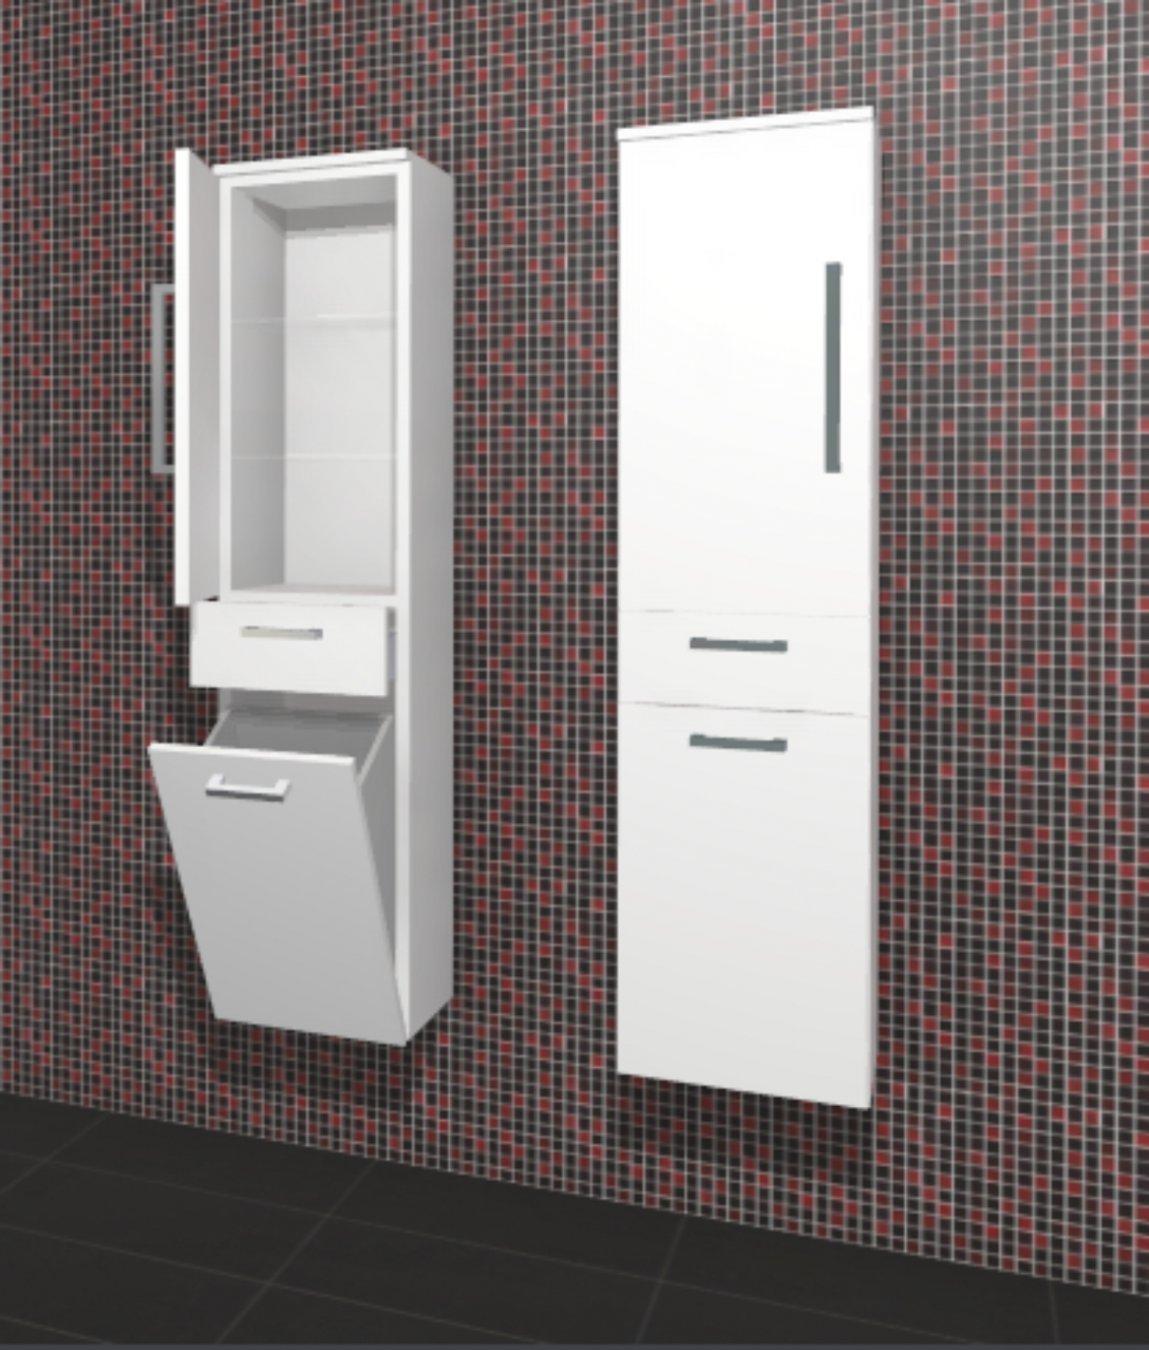 hochschrank crescendo badschrank puris. Black Bedroom Furniture Sets. Home Design Ideas